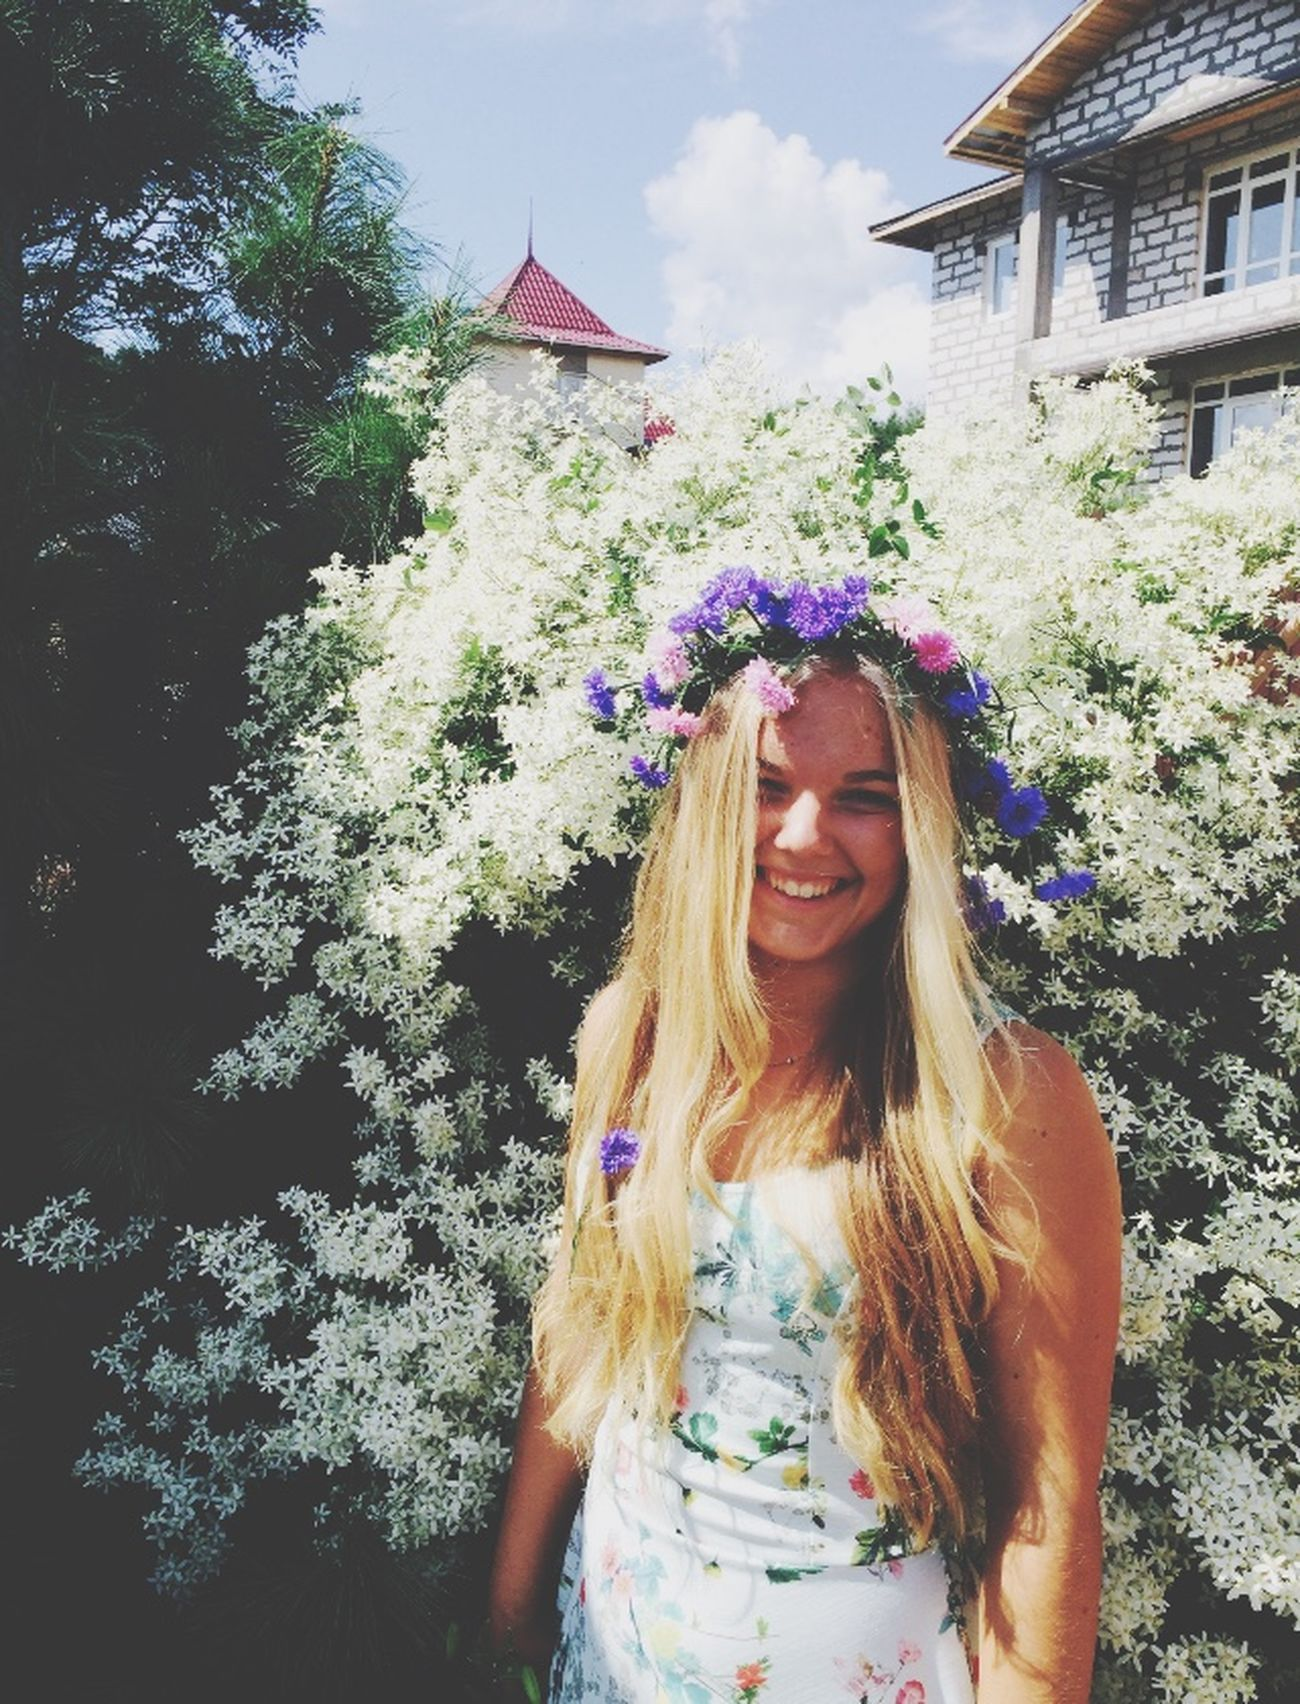 Flowers Flawless❤ Summer Sunny Day Memories Blonde Girl Hello World